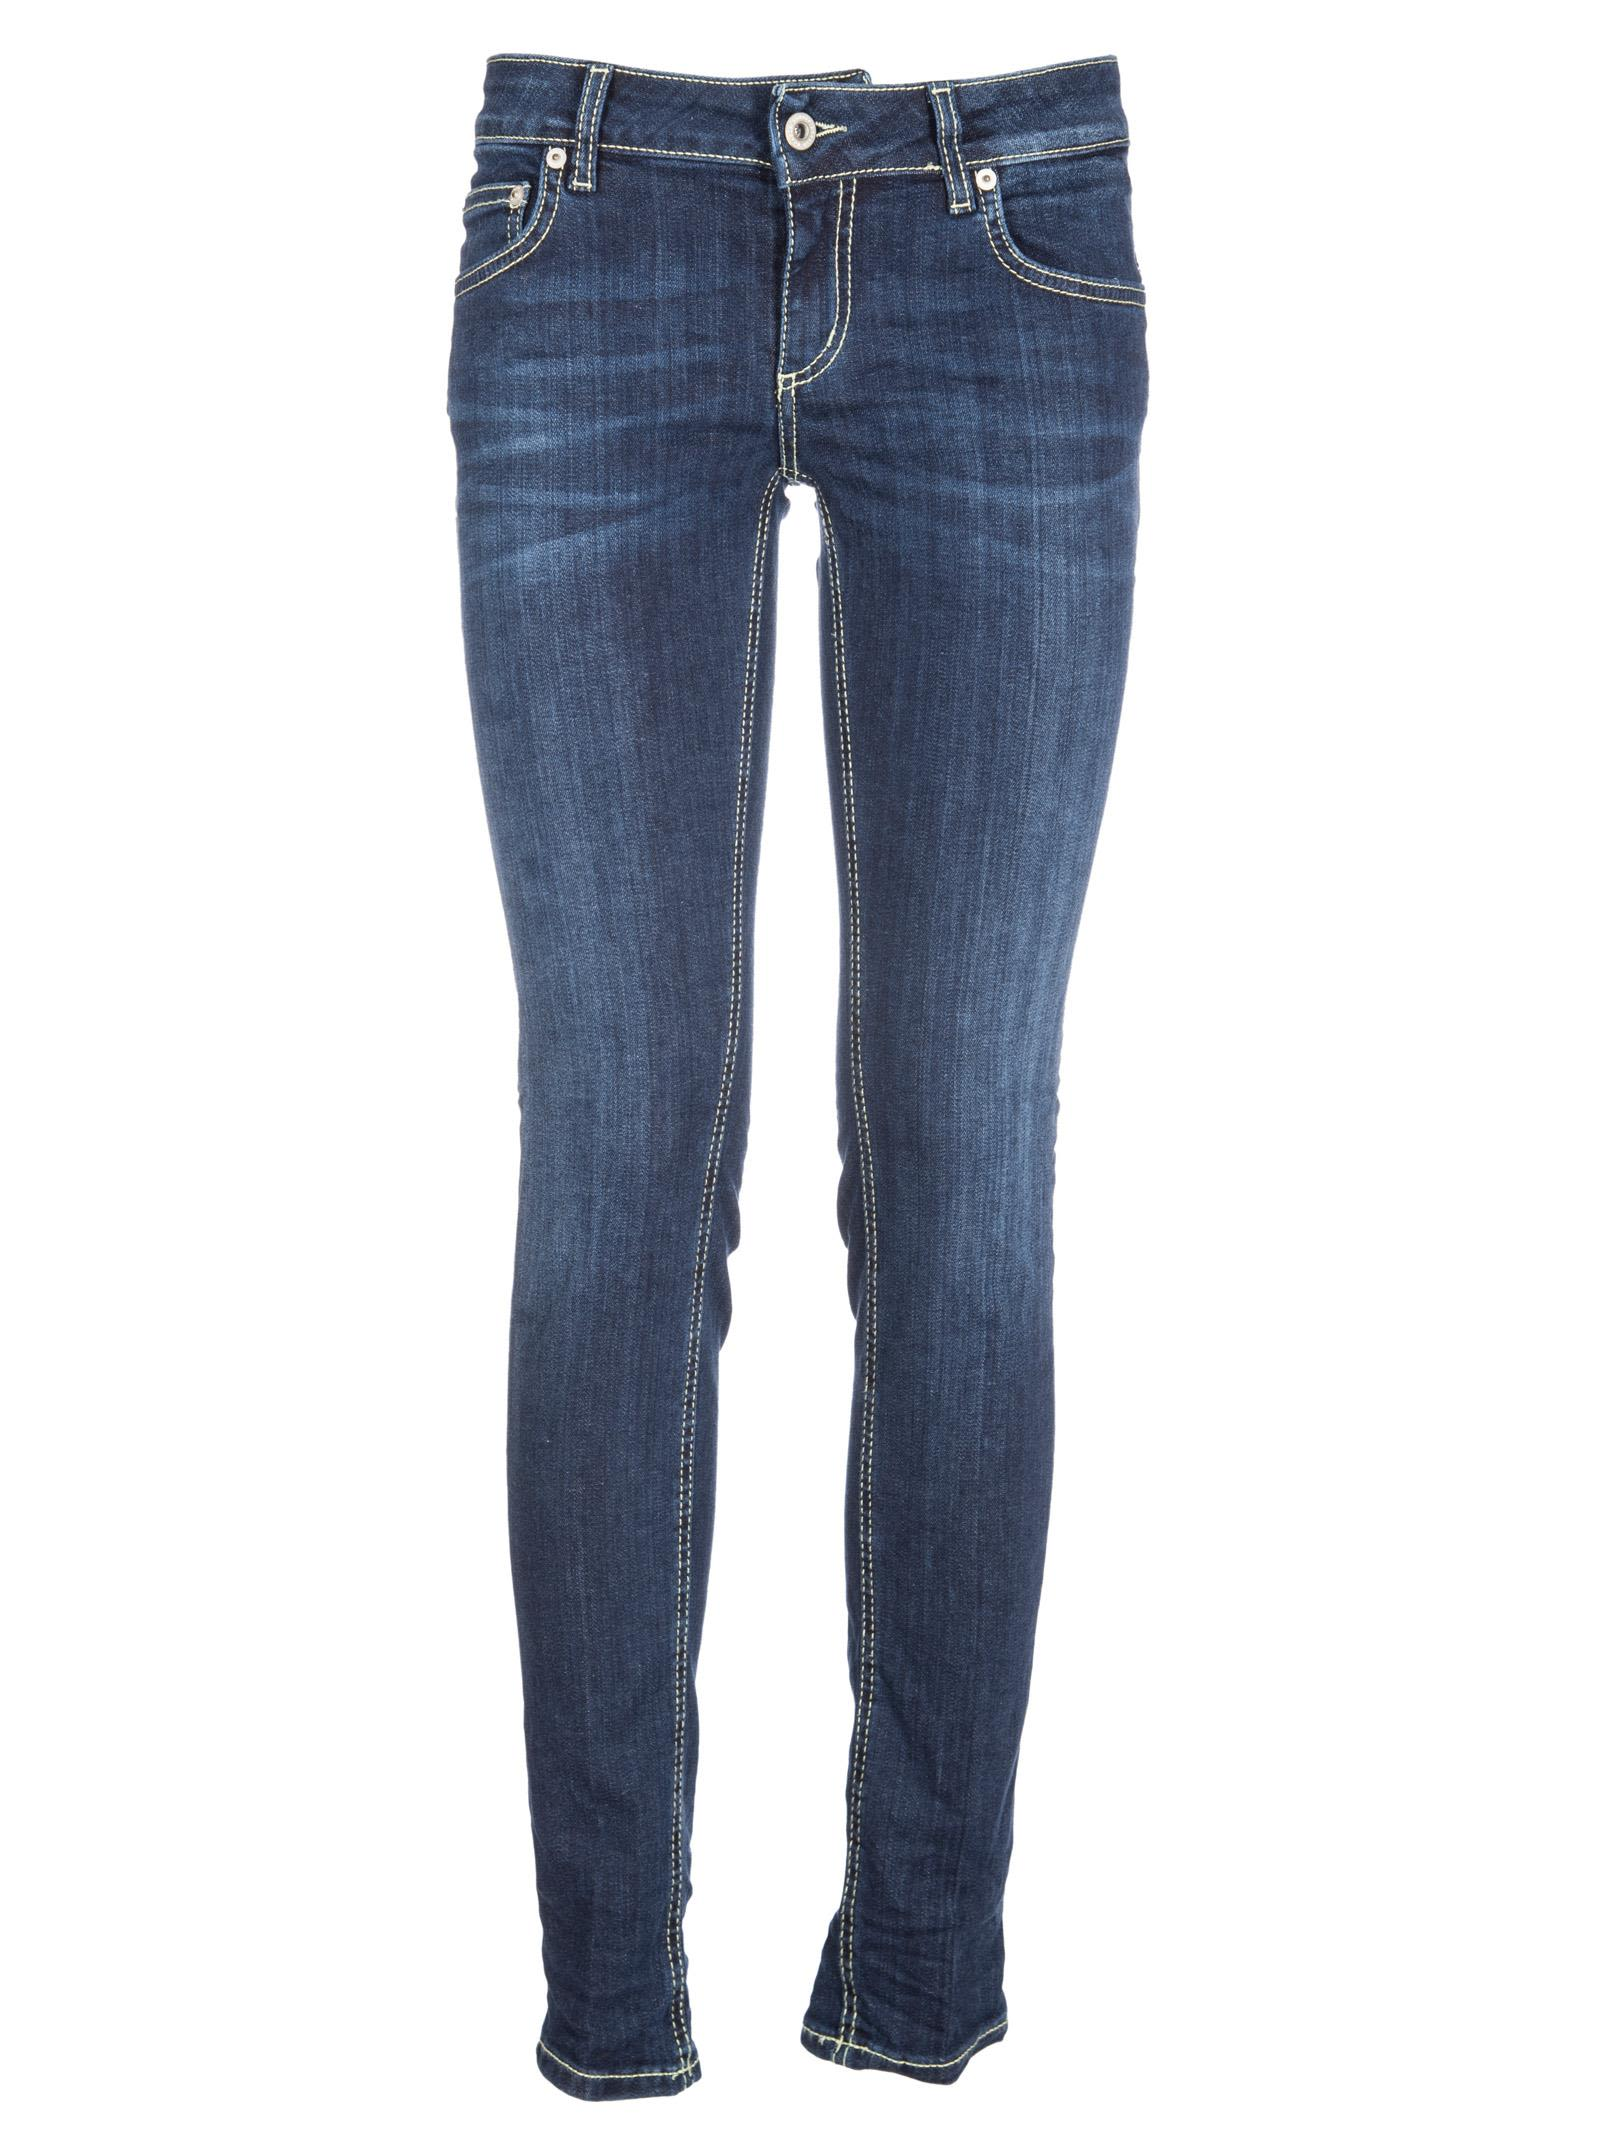 Dondup Skinny Super-stretch Jeans